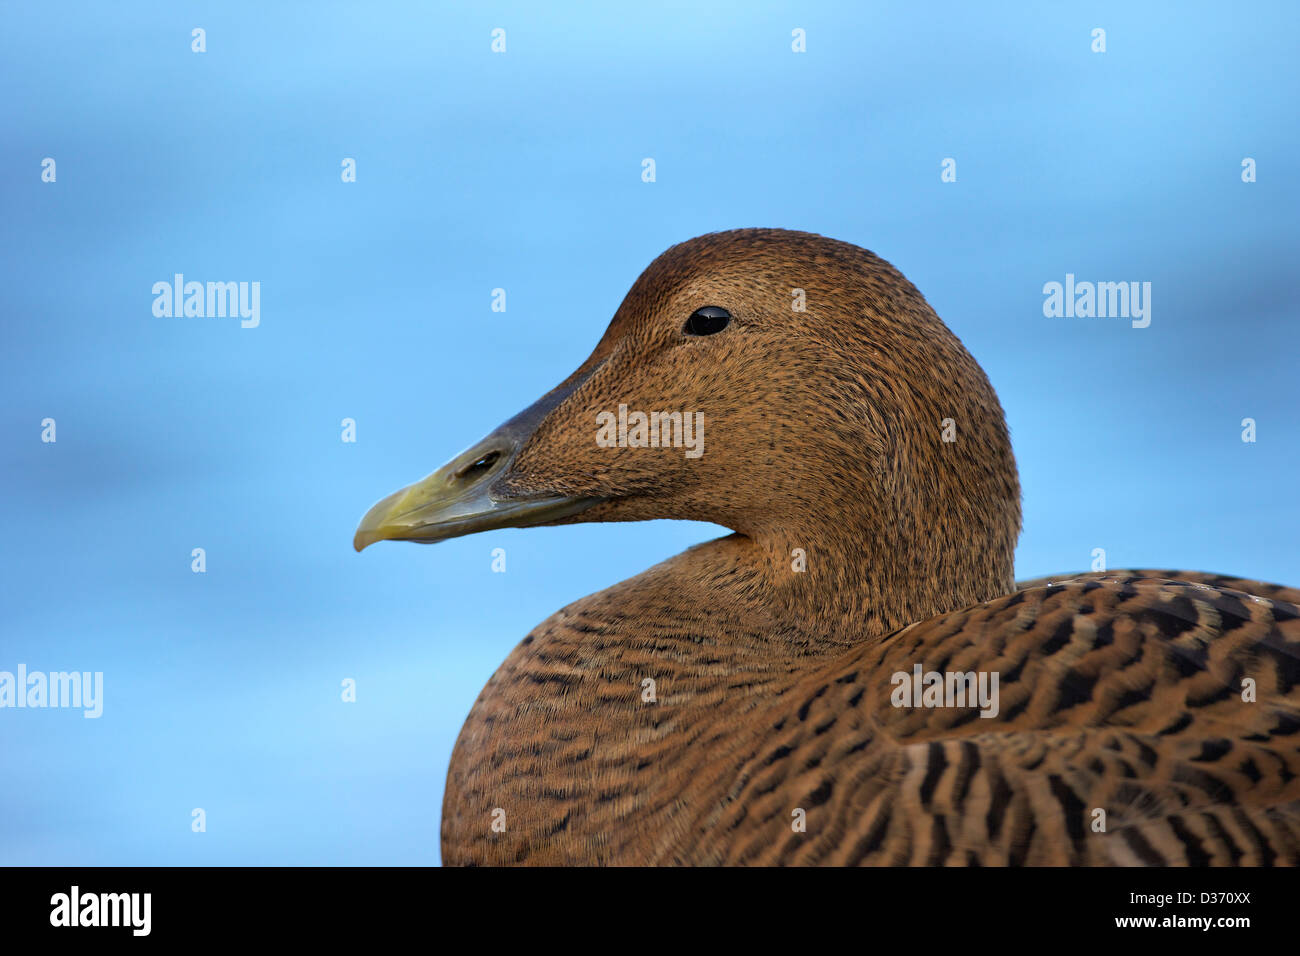 Common eider duck, Seahouses harbour, Northumberland, Northeast England, UK, GB - Stock Image